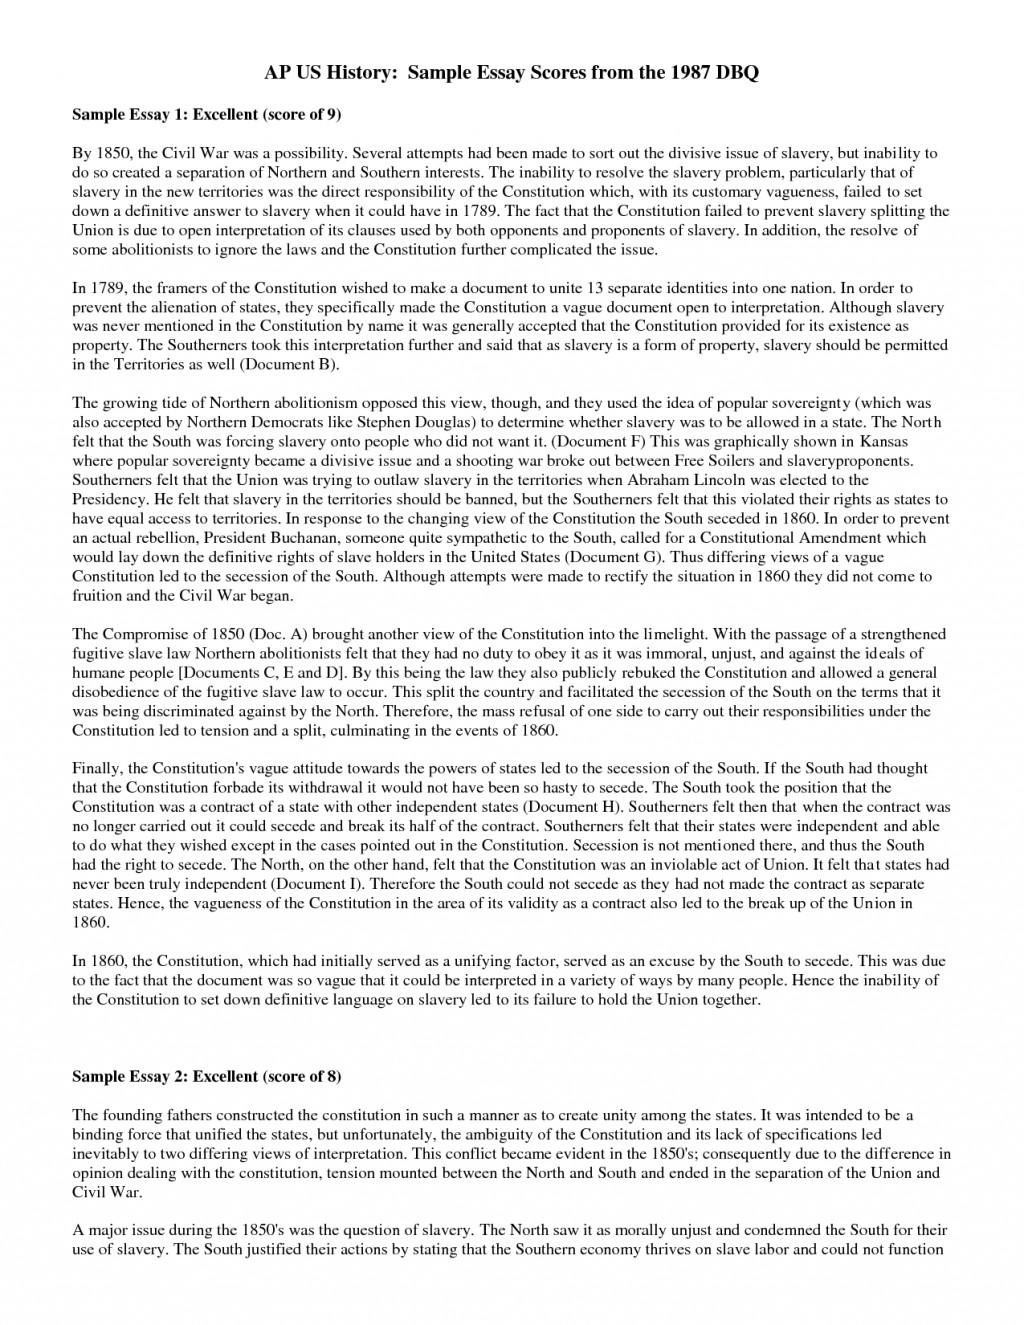 002 Ybw4oskdzu Essay Example Sample Magnificent Dbq 5th Grade Ap Euro Global History Large